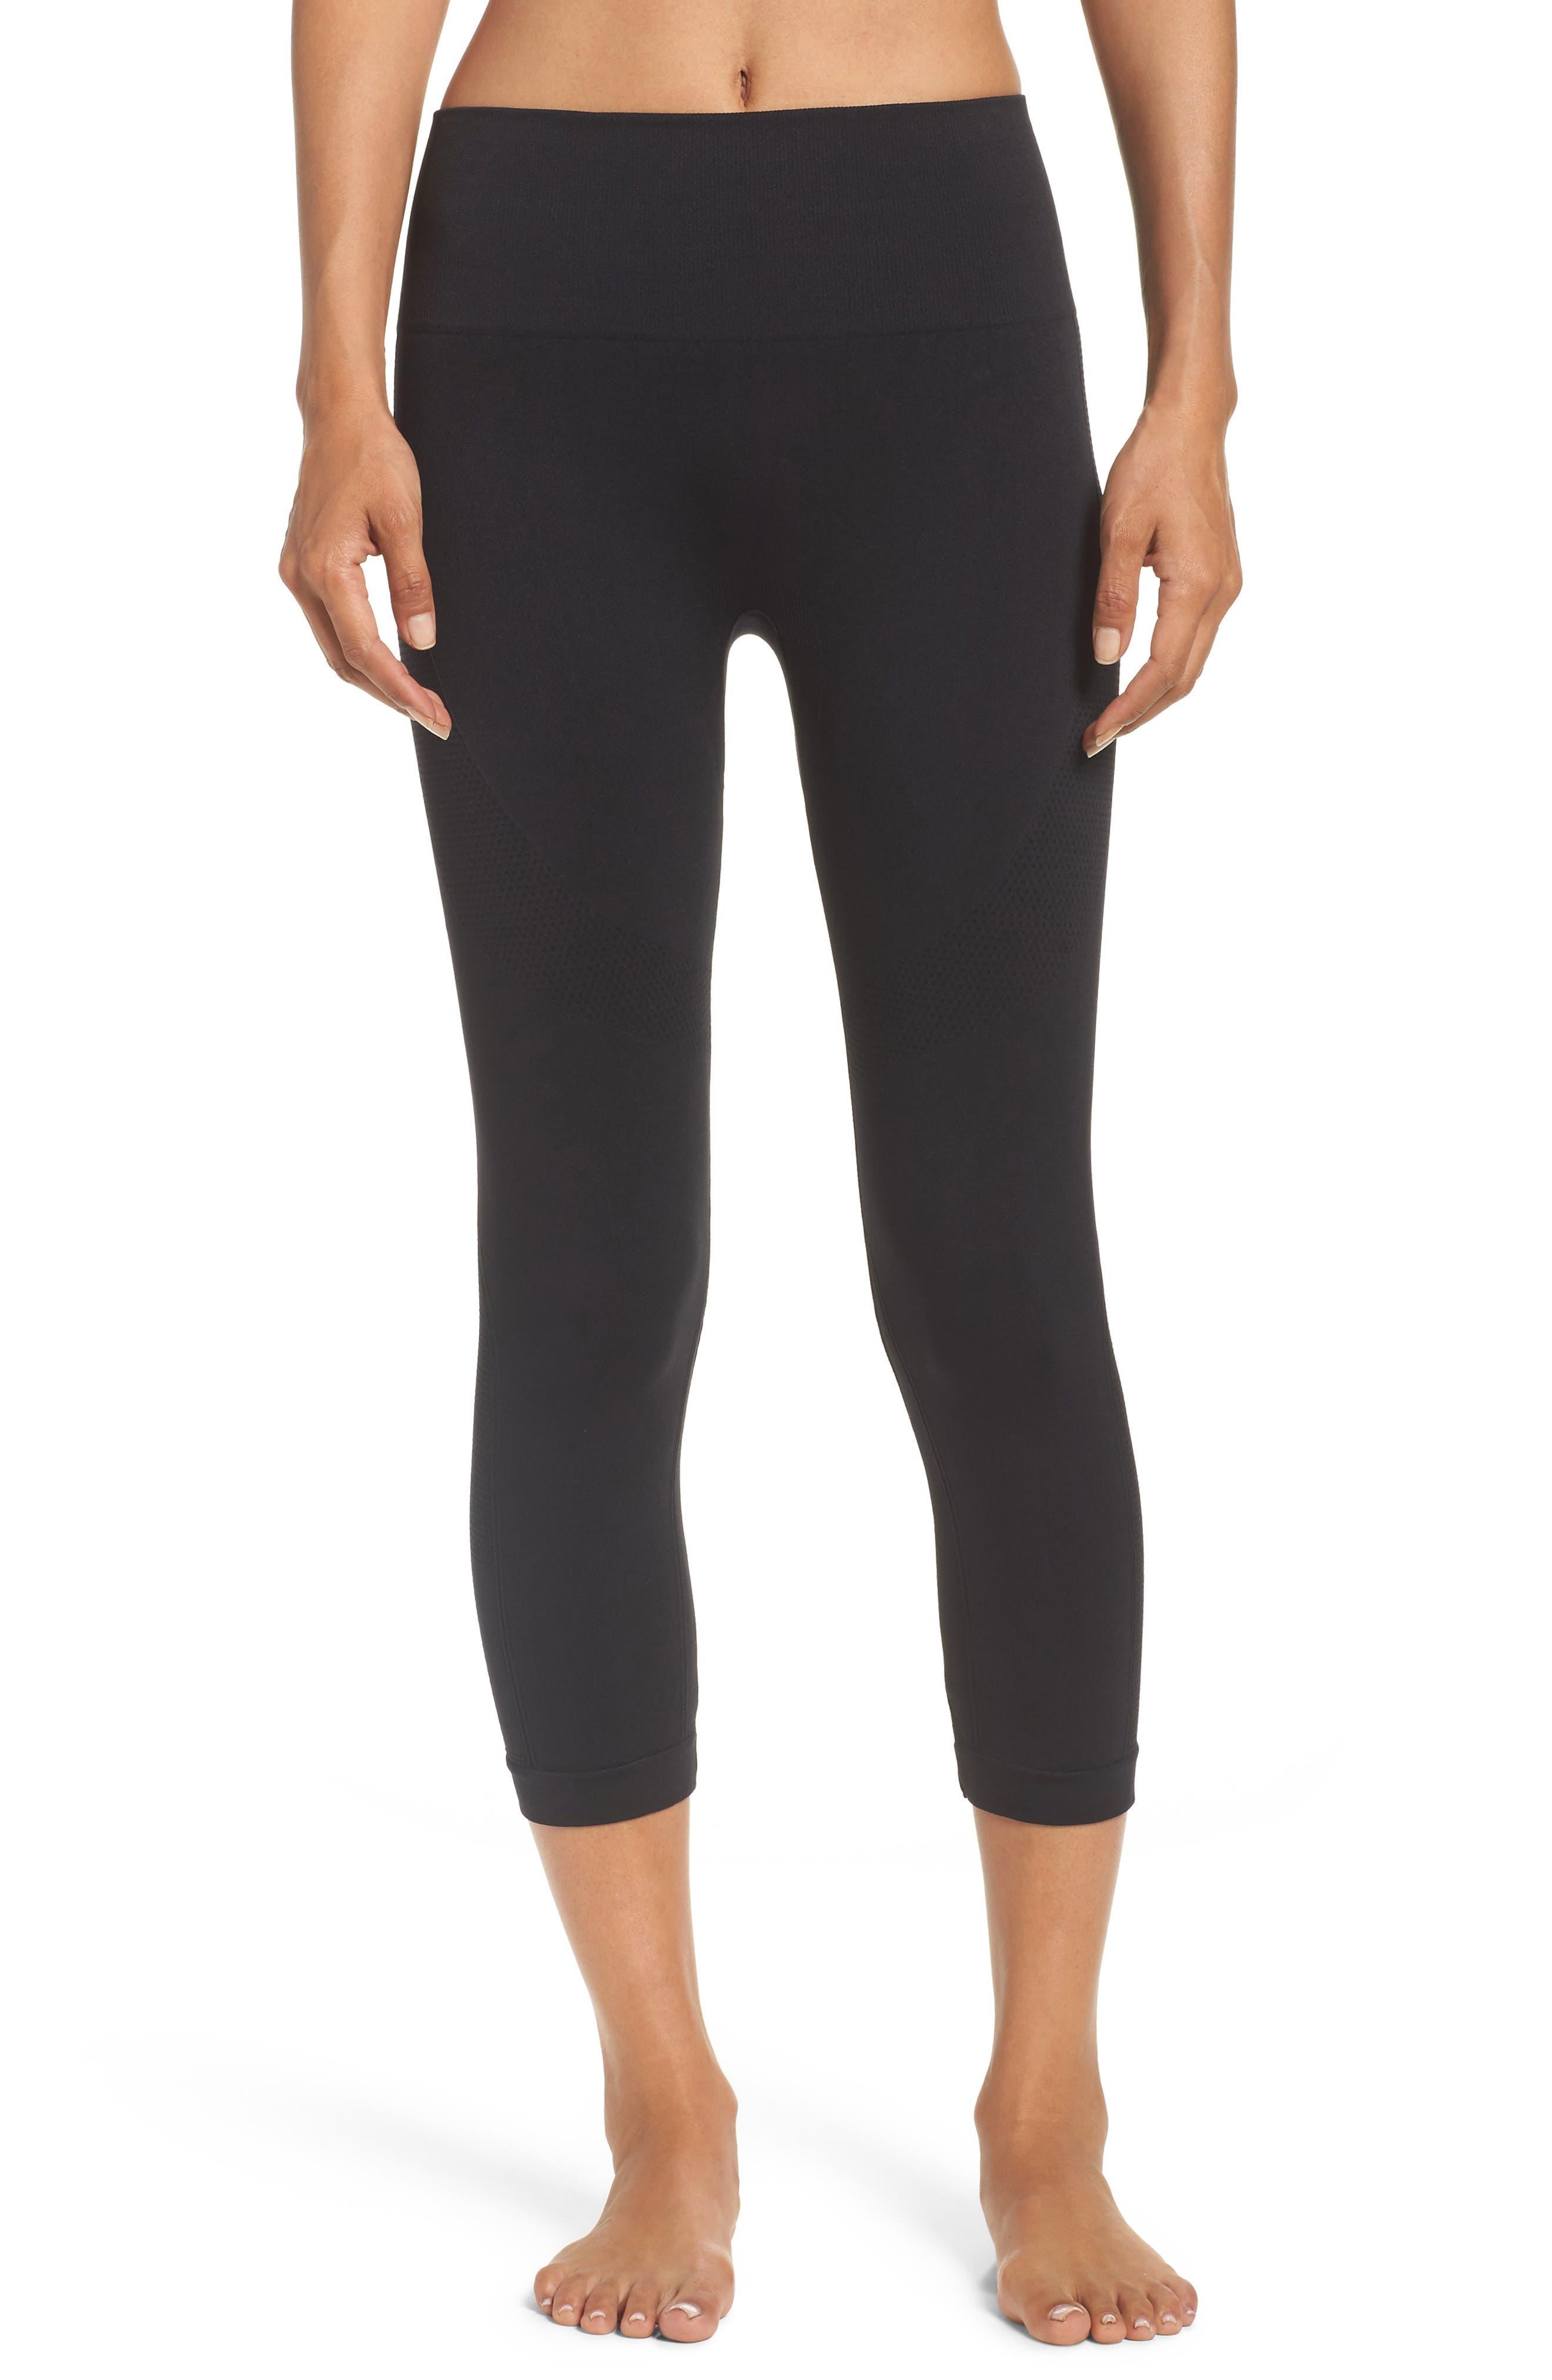 Climawear Set the Pace High Waist Capri Leggings